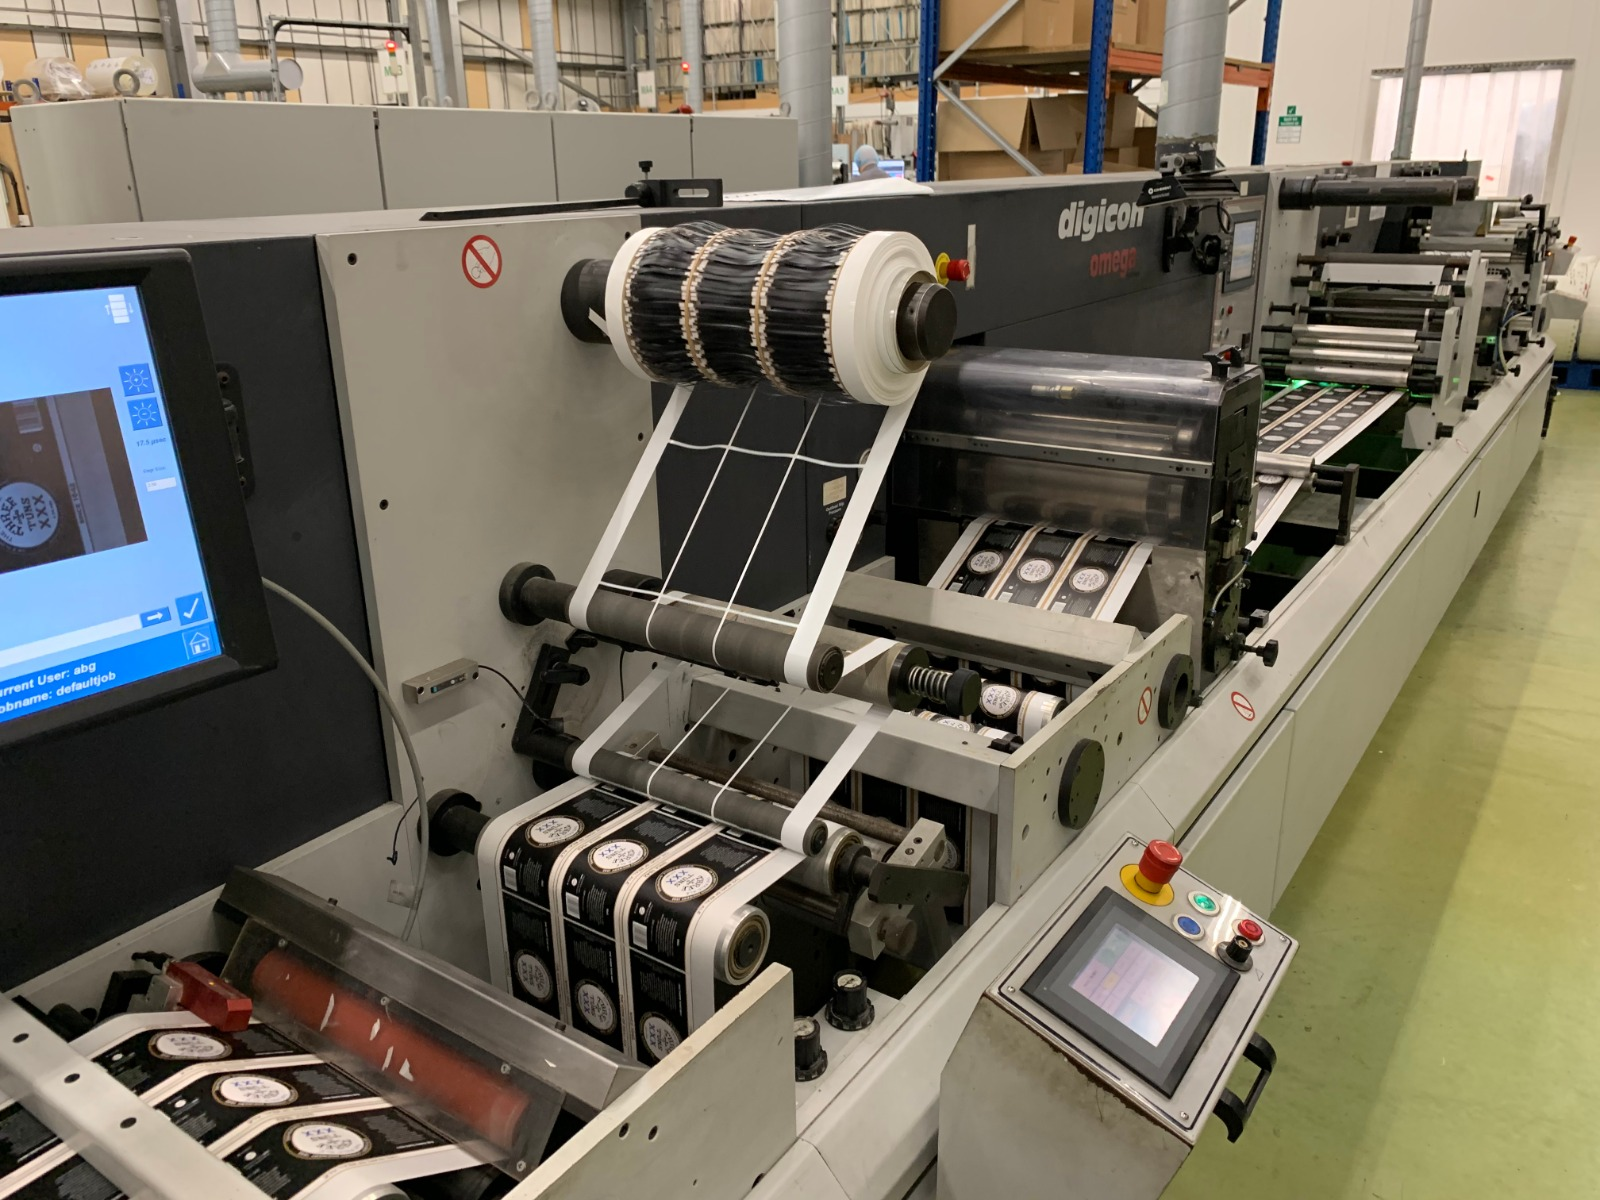 ABG Digicon Series 1 - Used Flexo Printing Presses and Used Flexographic Equipment-6